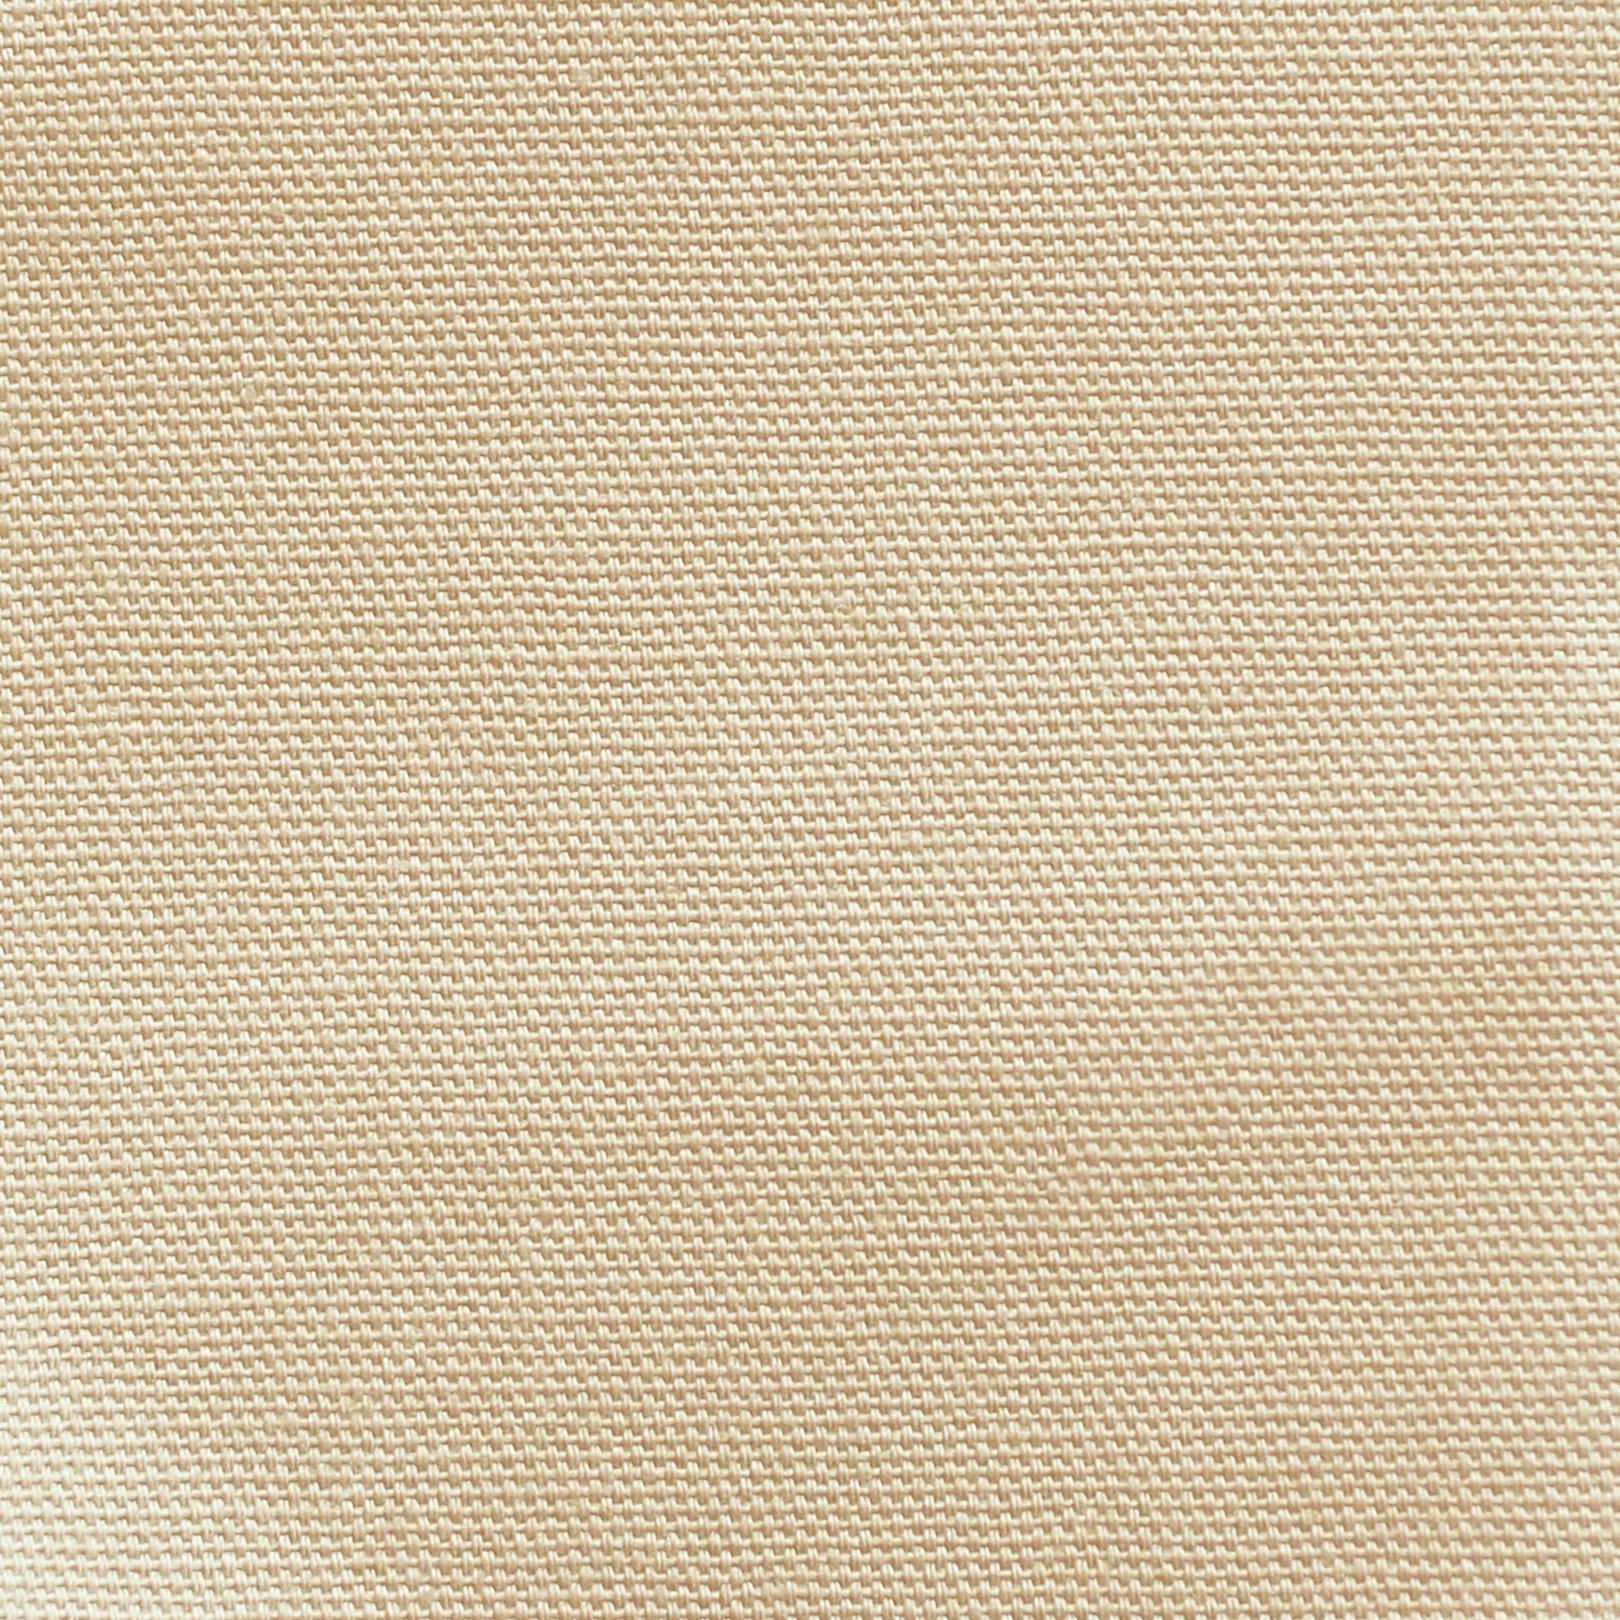 organic sofa fabric natural color